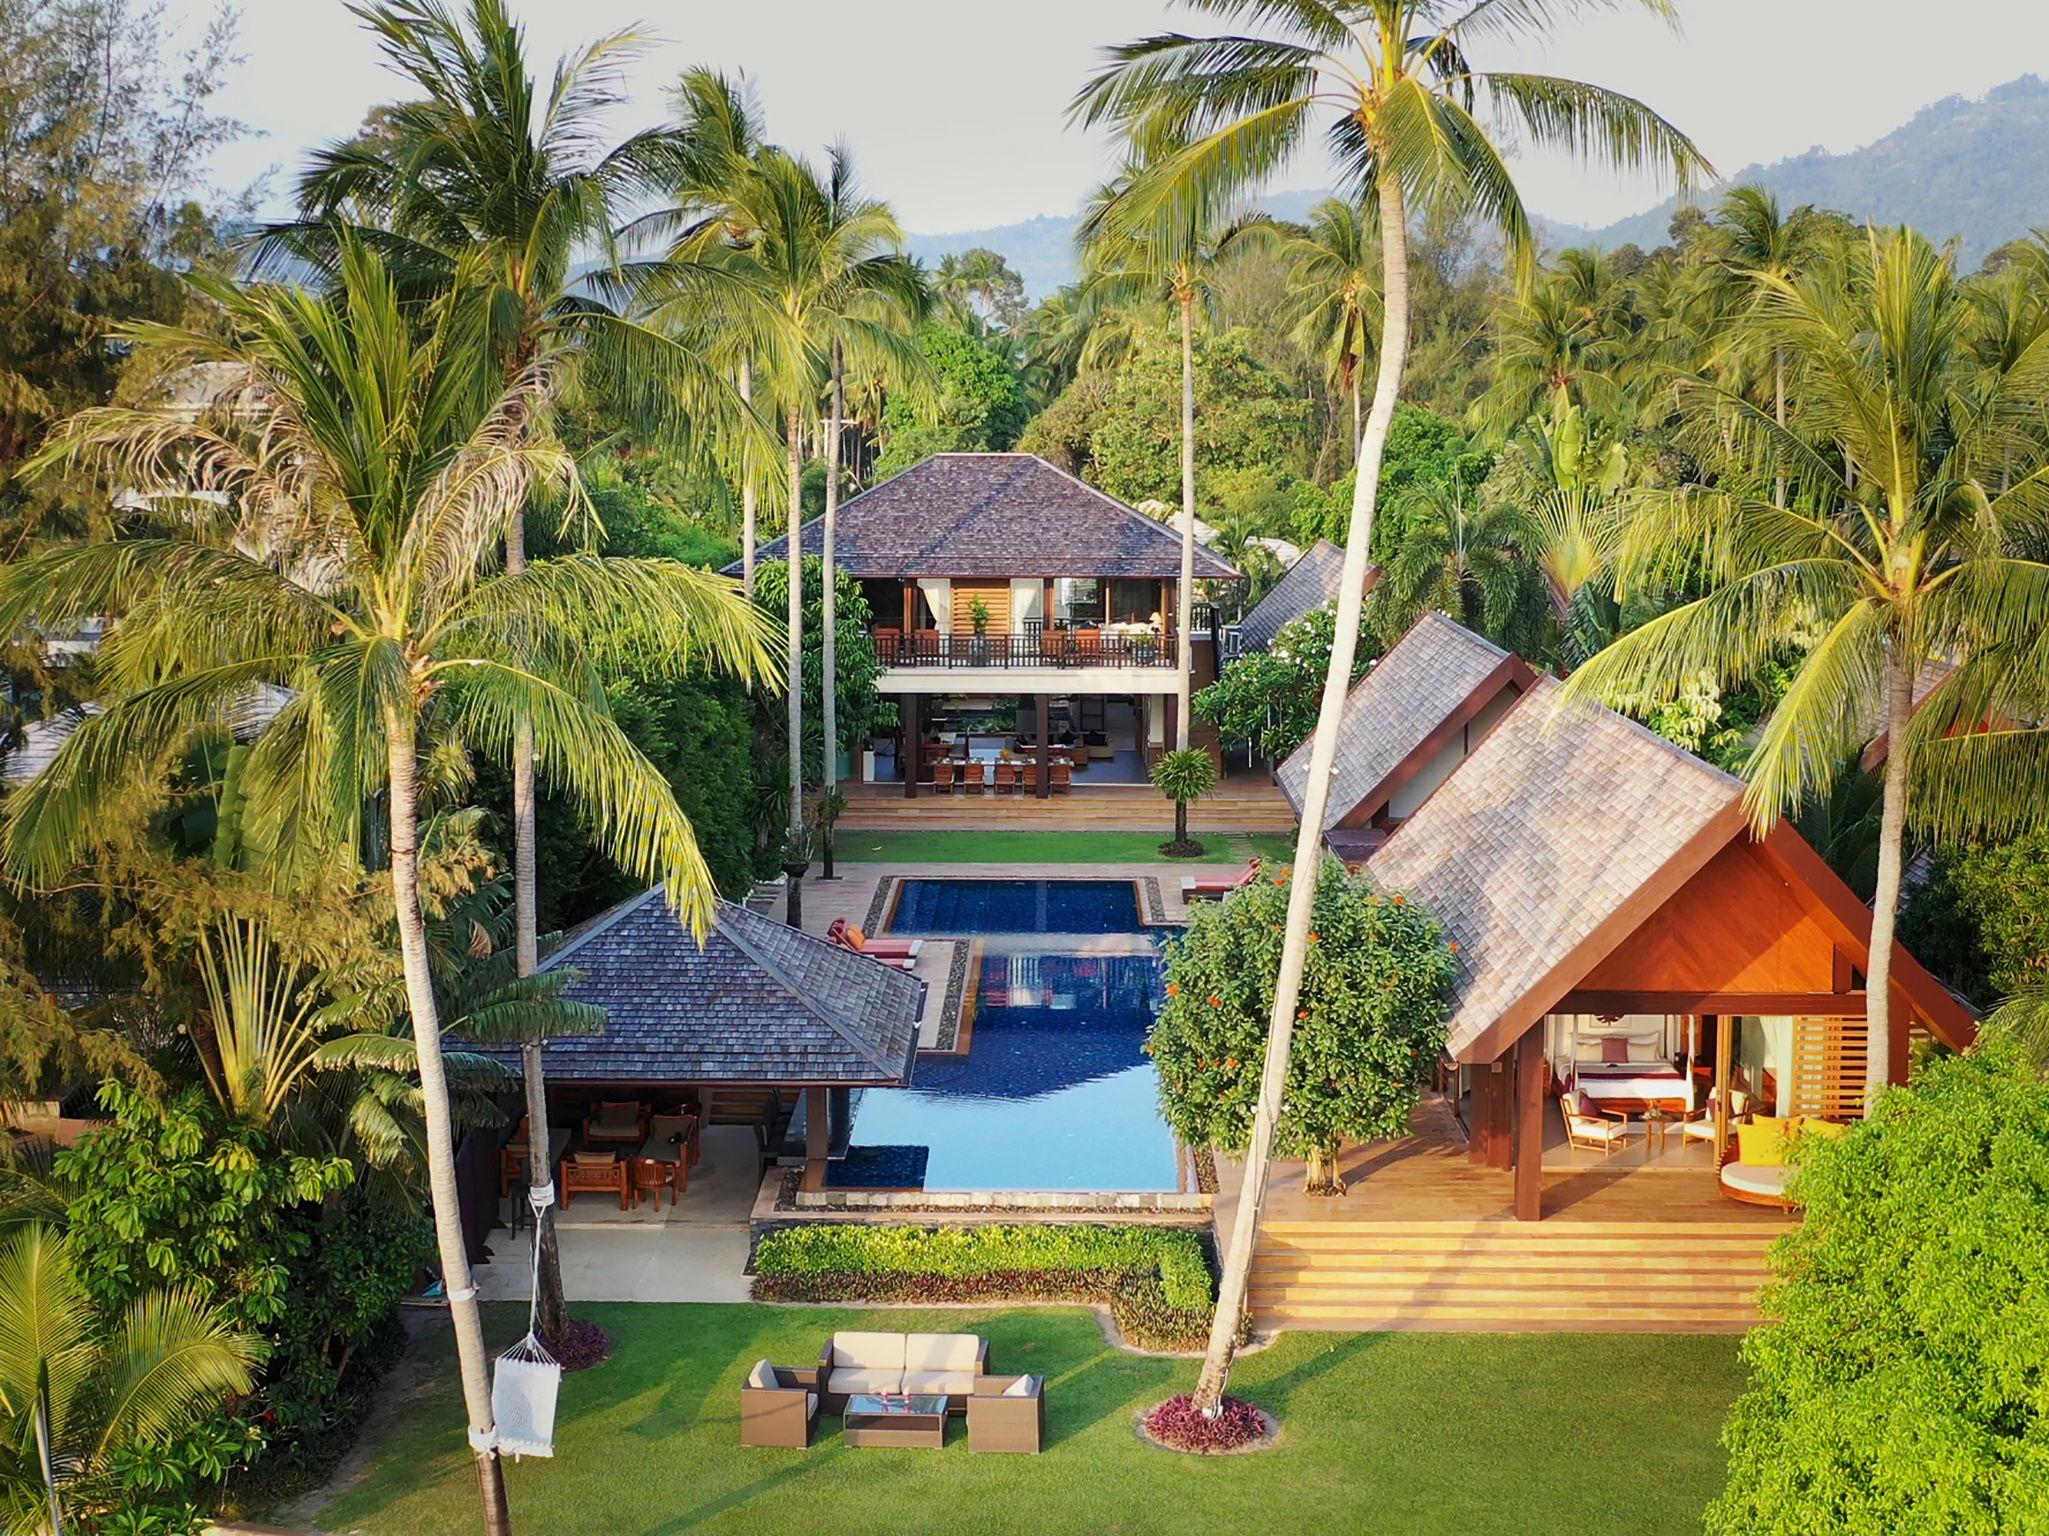 Baan Puri - Tropical holiday home